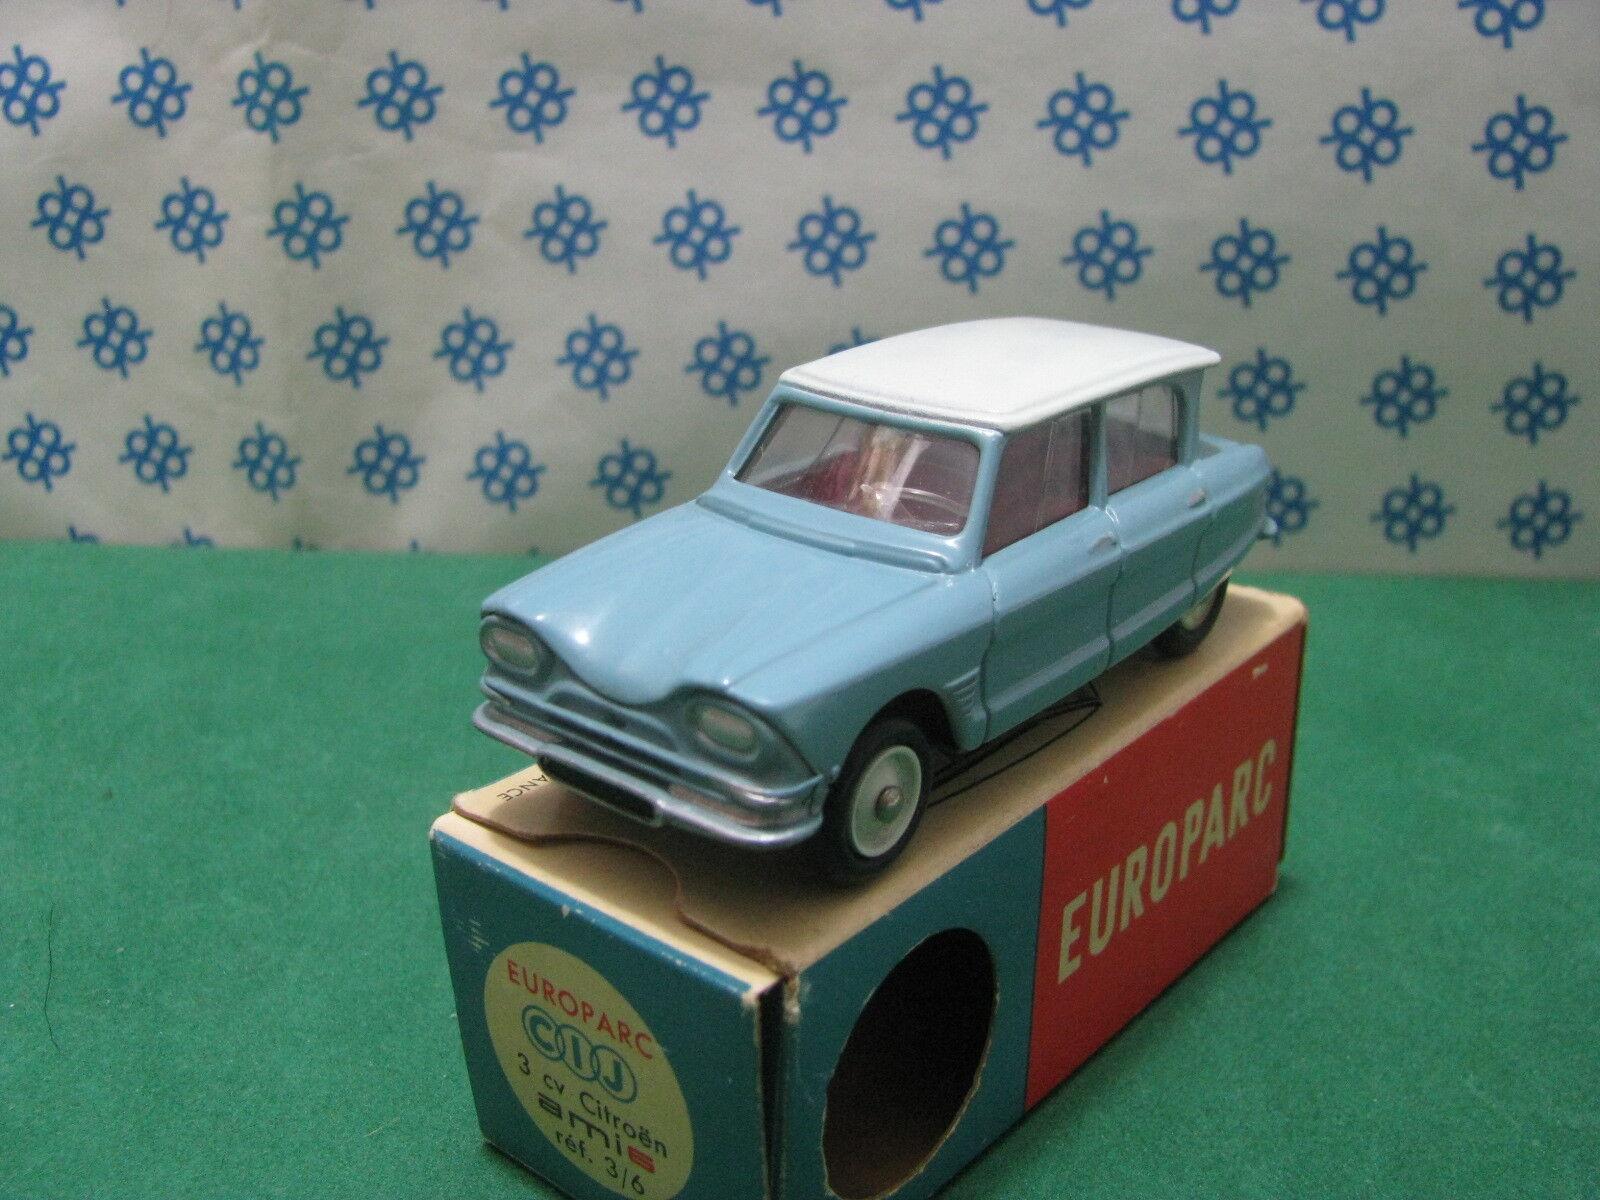 Vintage CIJ Europarc 3 6 - CITROEN AMI 3 Cv France Superbe  MIB